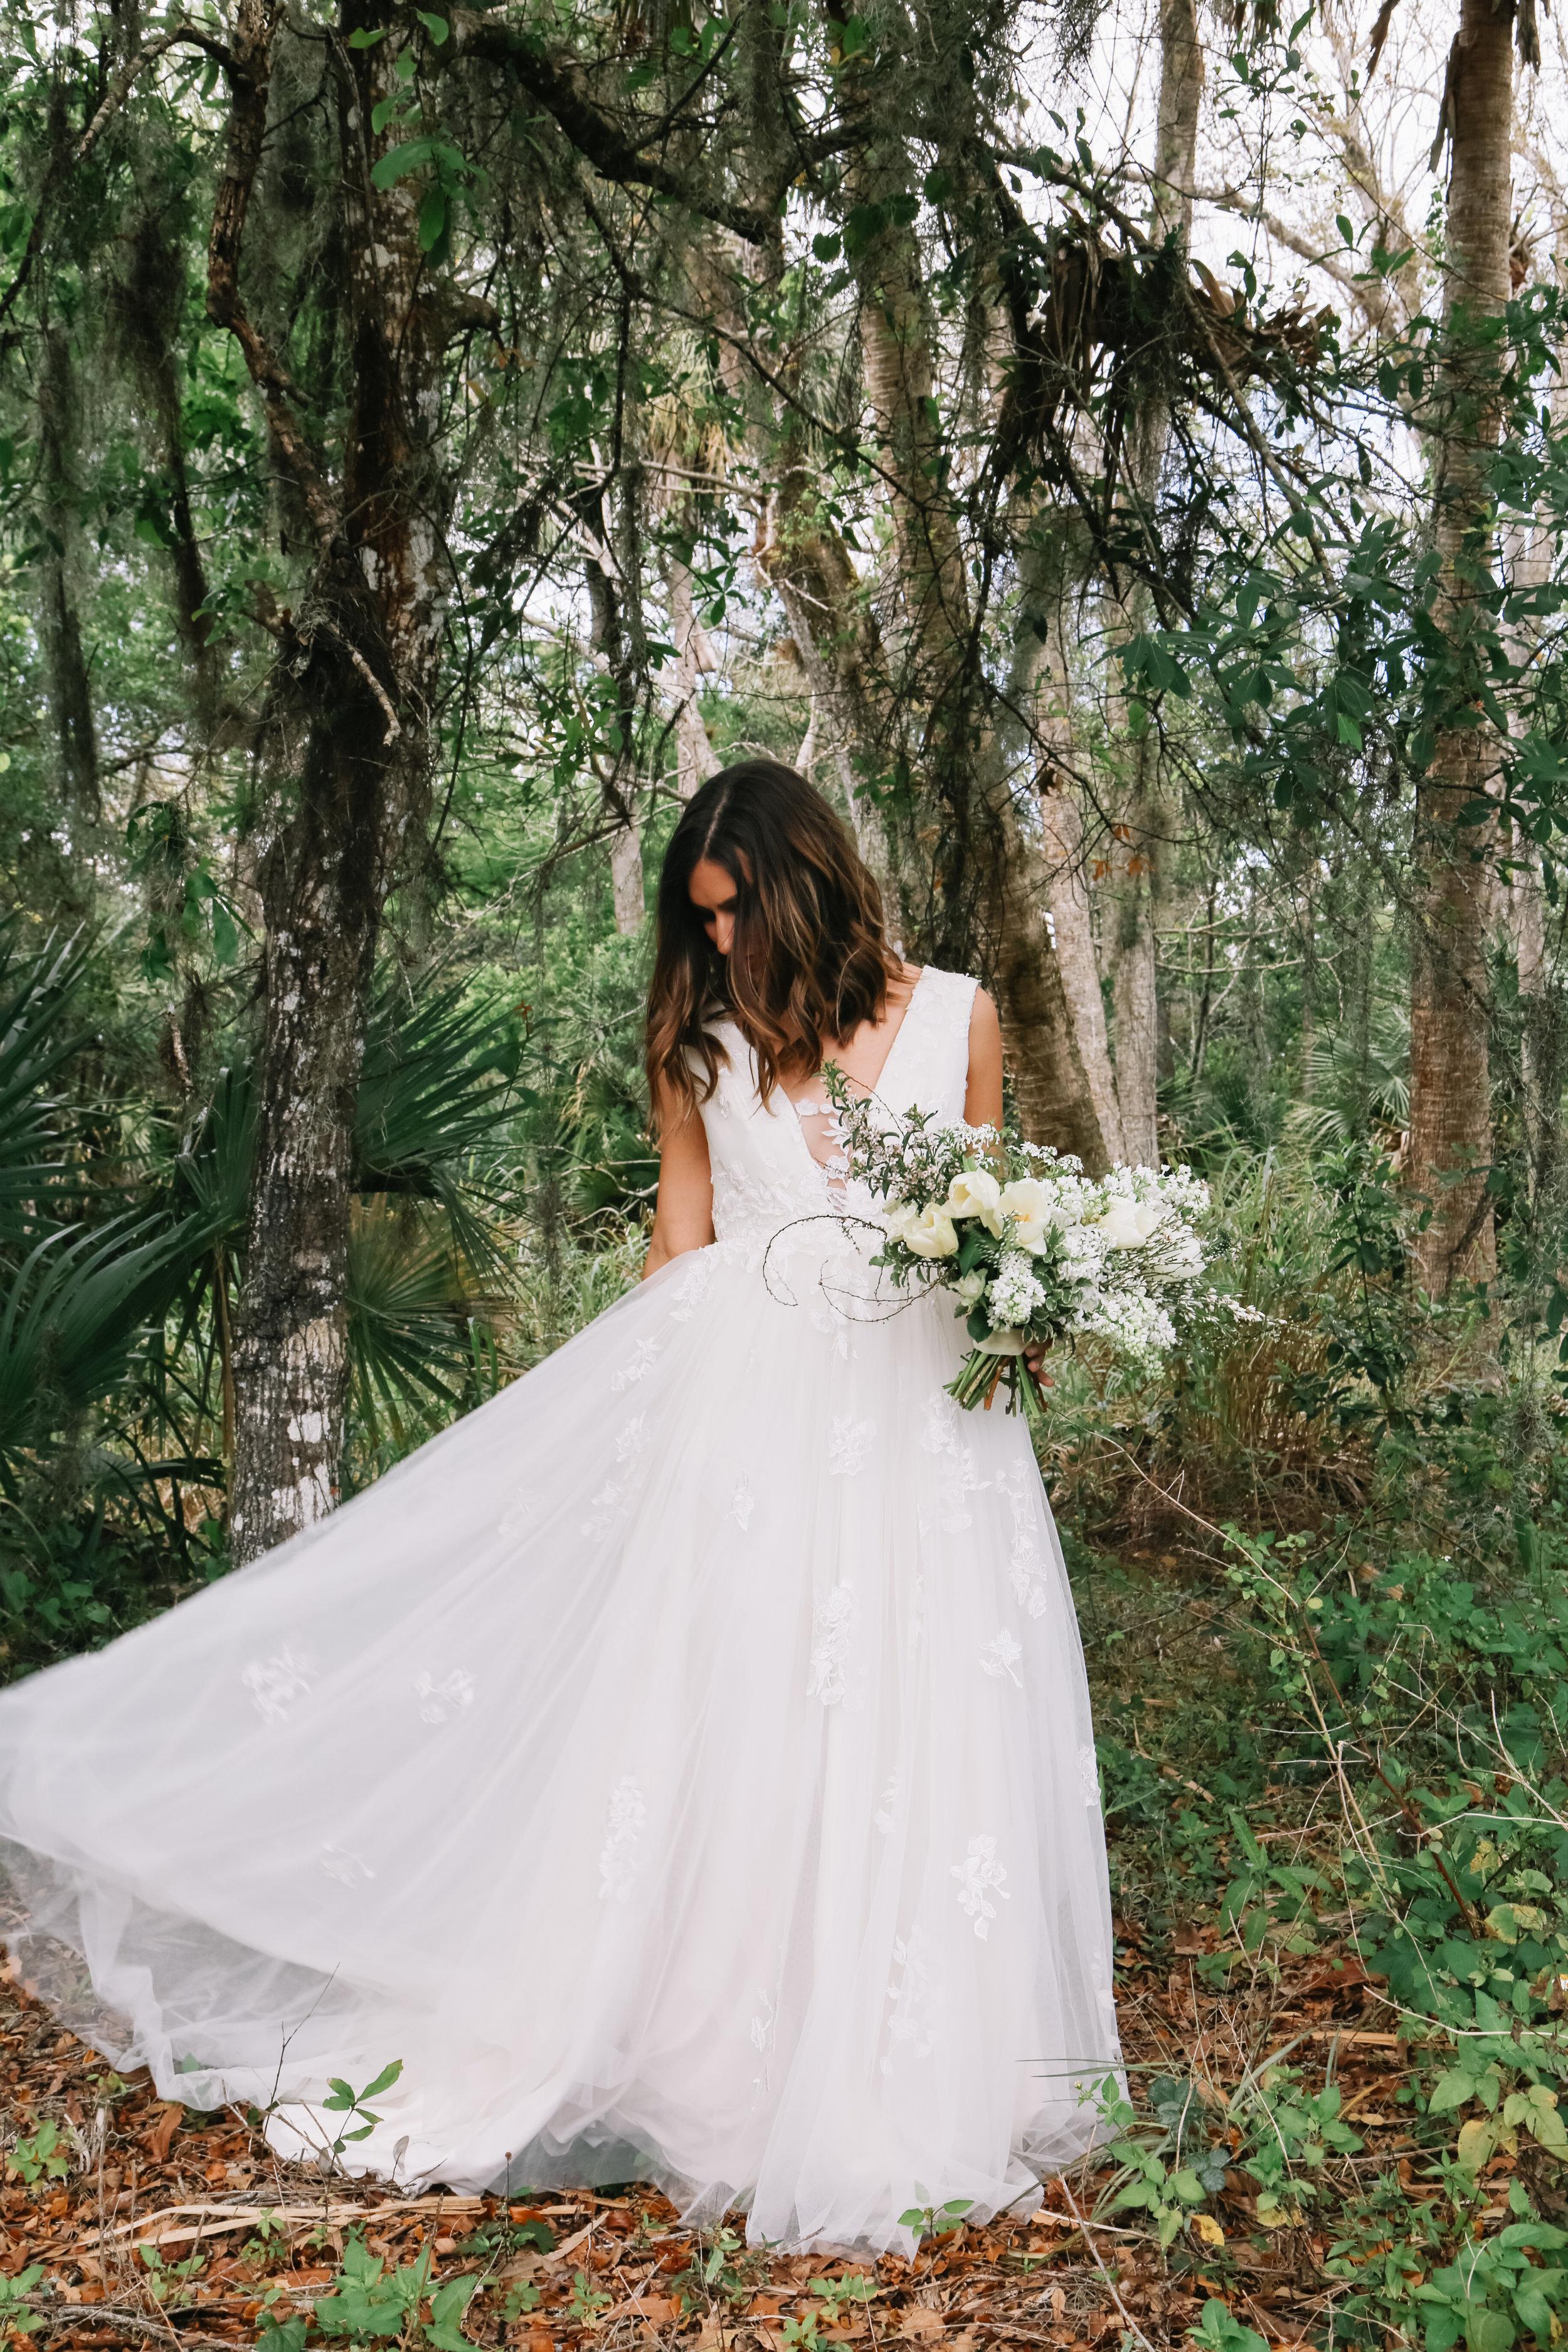 garden-style-bridal-bouquet